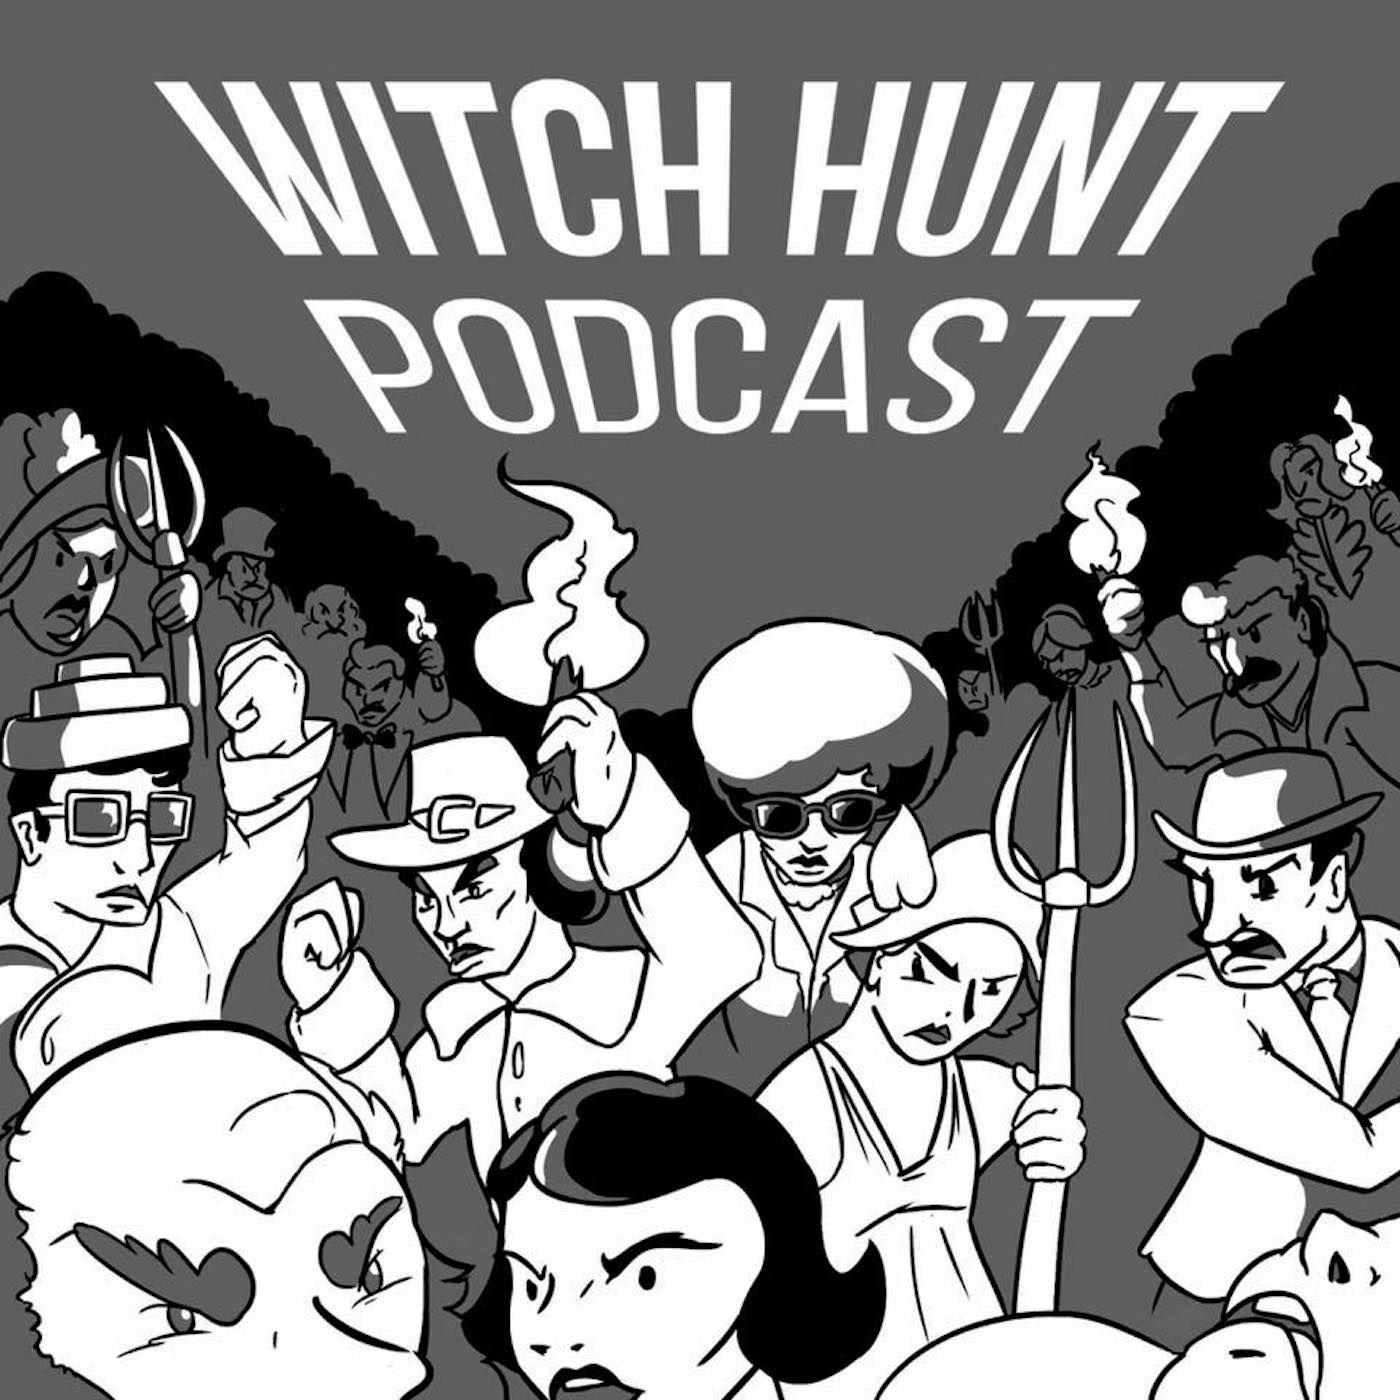 Witch Hunt Podcast | Listen via Stitcher for Podcasts